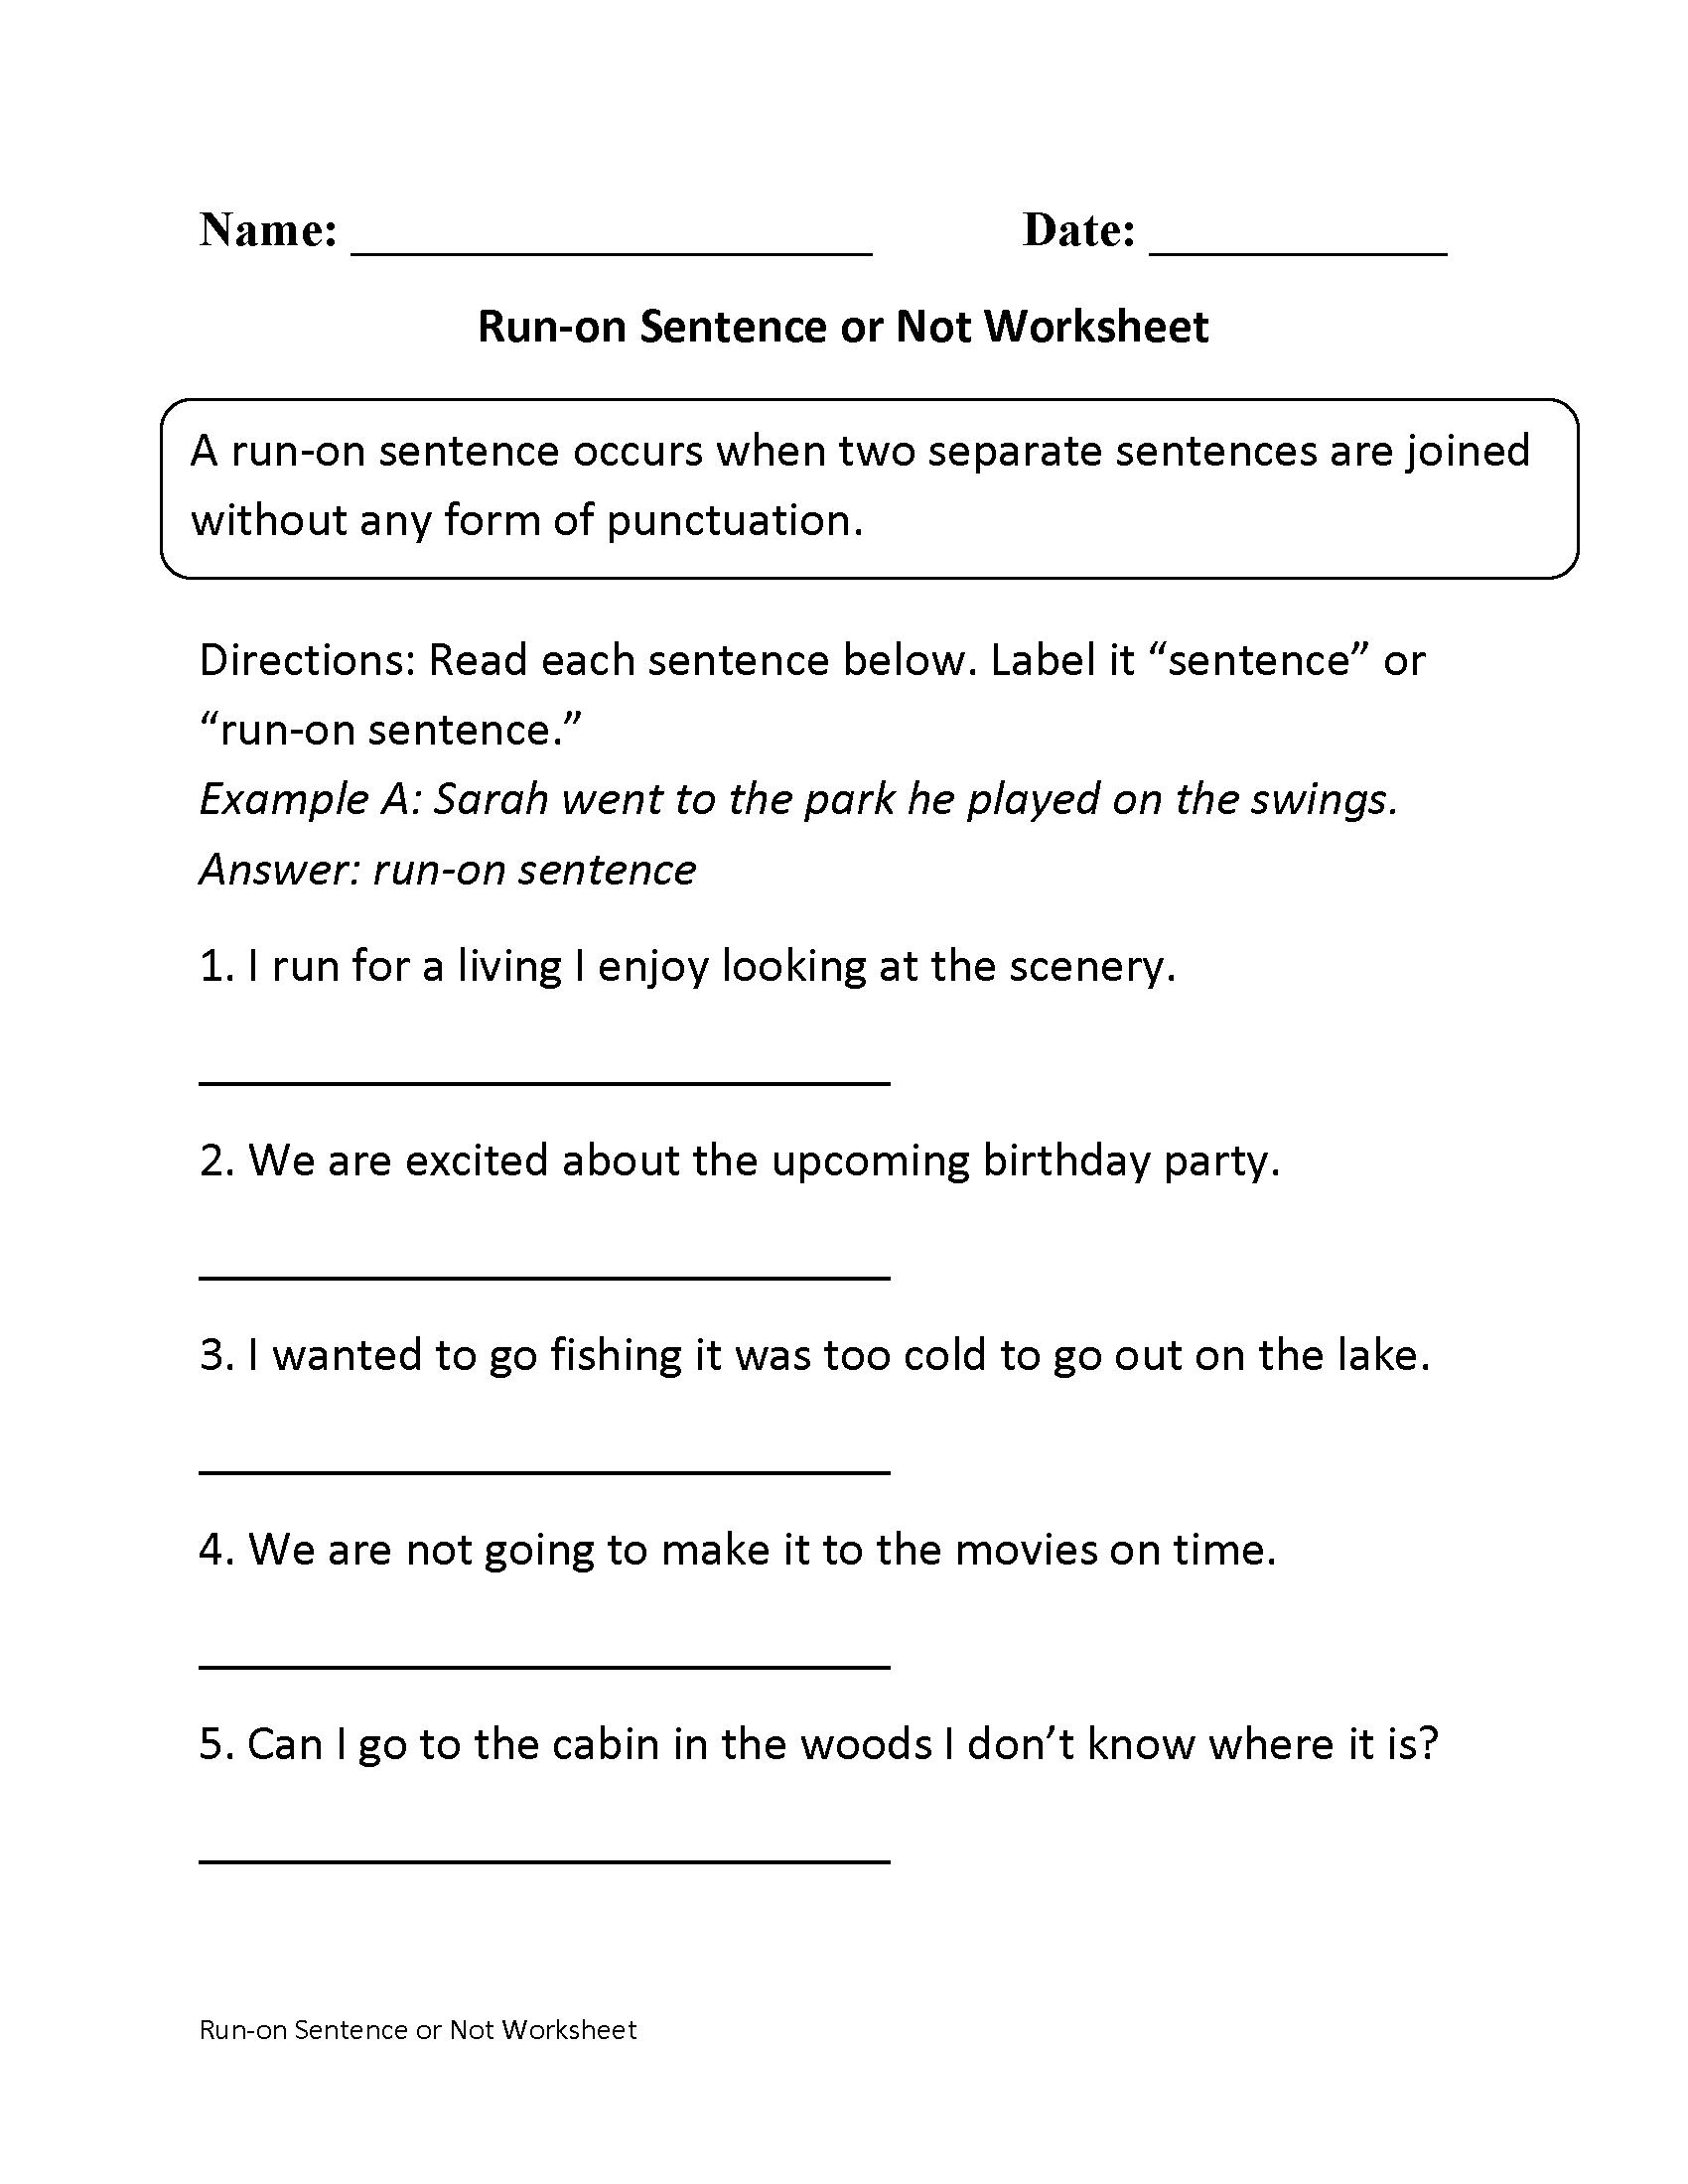 Sentences Worksheets | Run On Sentences Worksheets - Free Printable Sentence Correction Worksheets